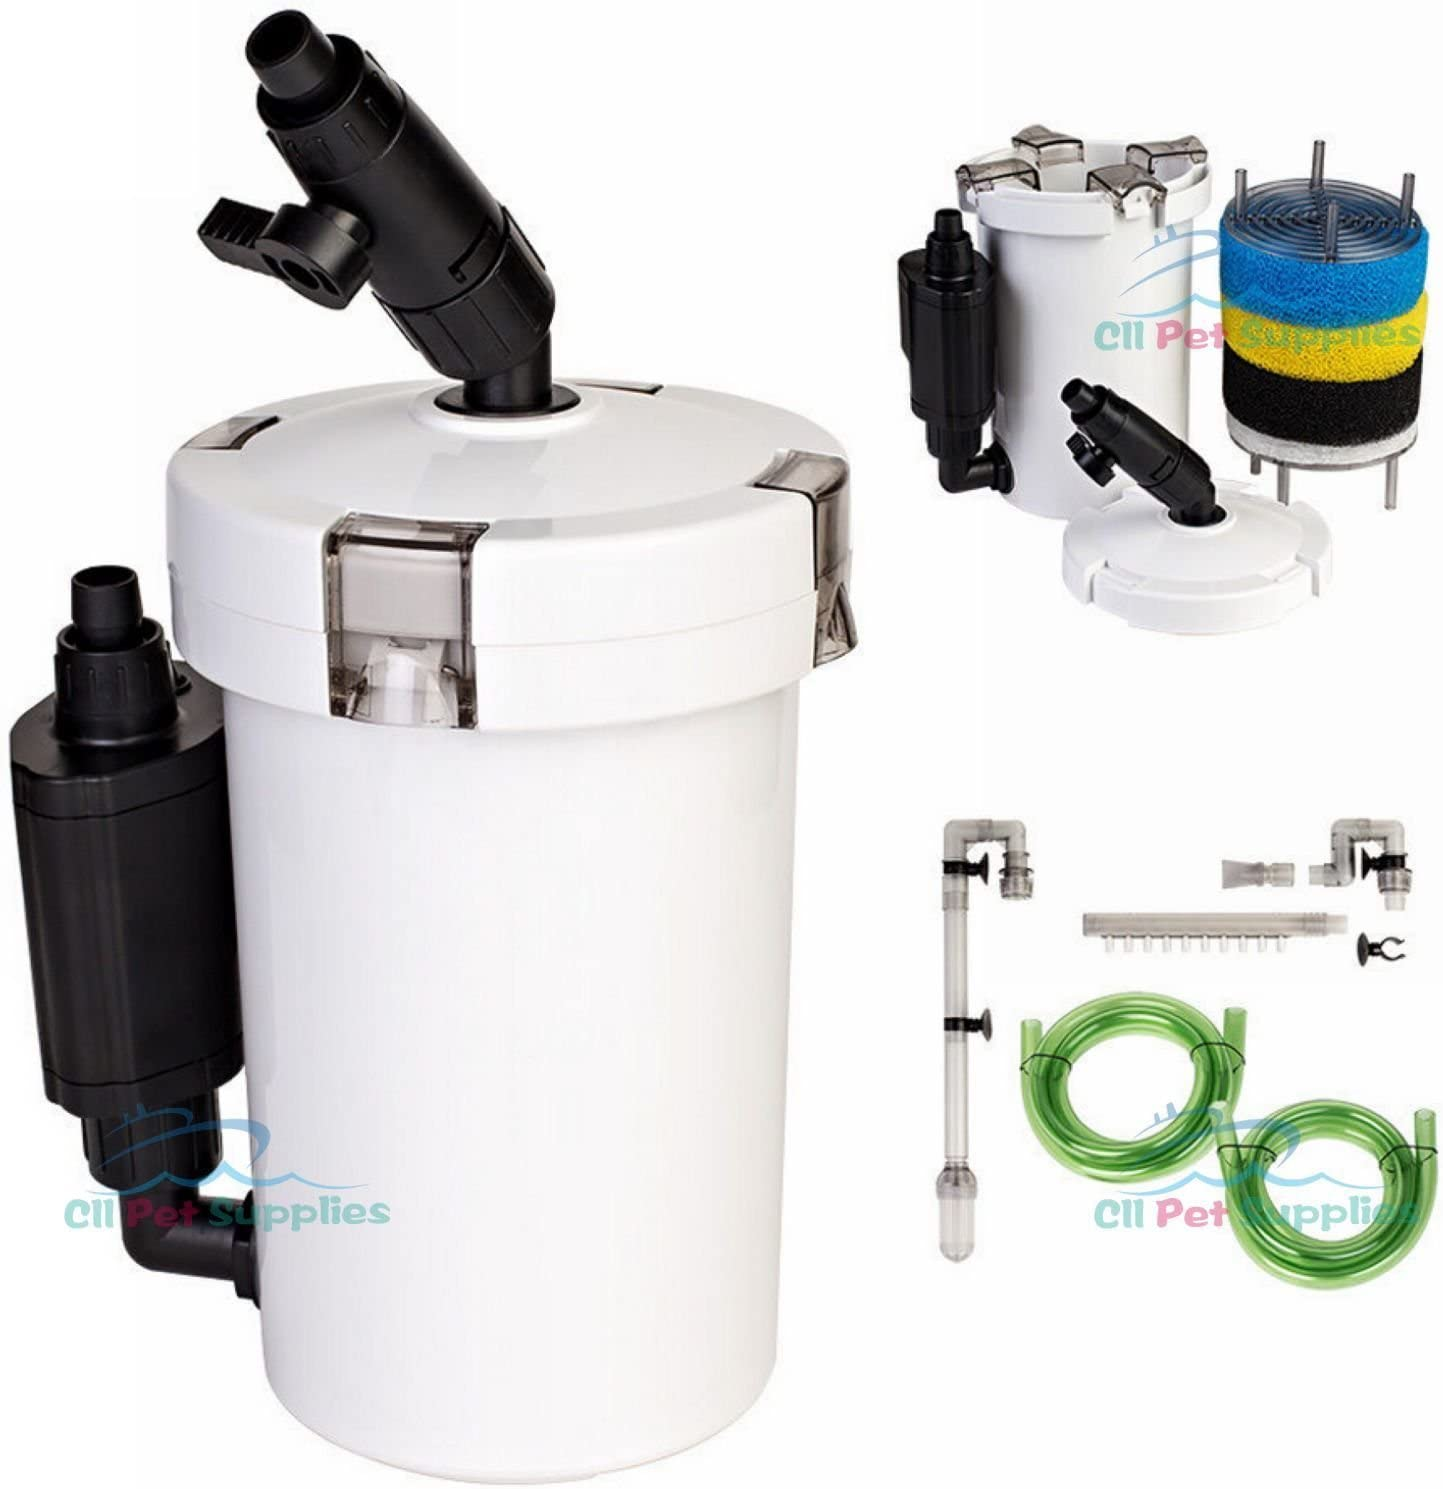 External Fish Tank Superior UV Sterilised Filtration Excelsior Aquarium Cannister Filters Packed Full Of Media For Parasite /& Algae Free Aquarium Water Excelsior 540